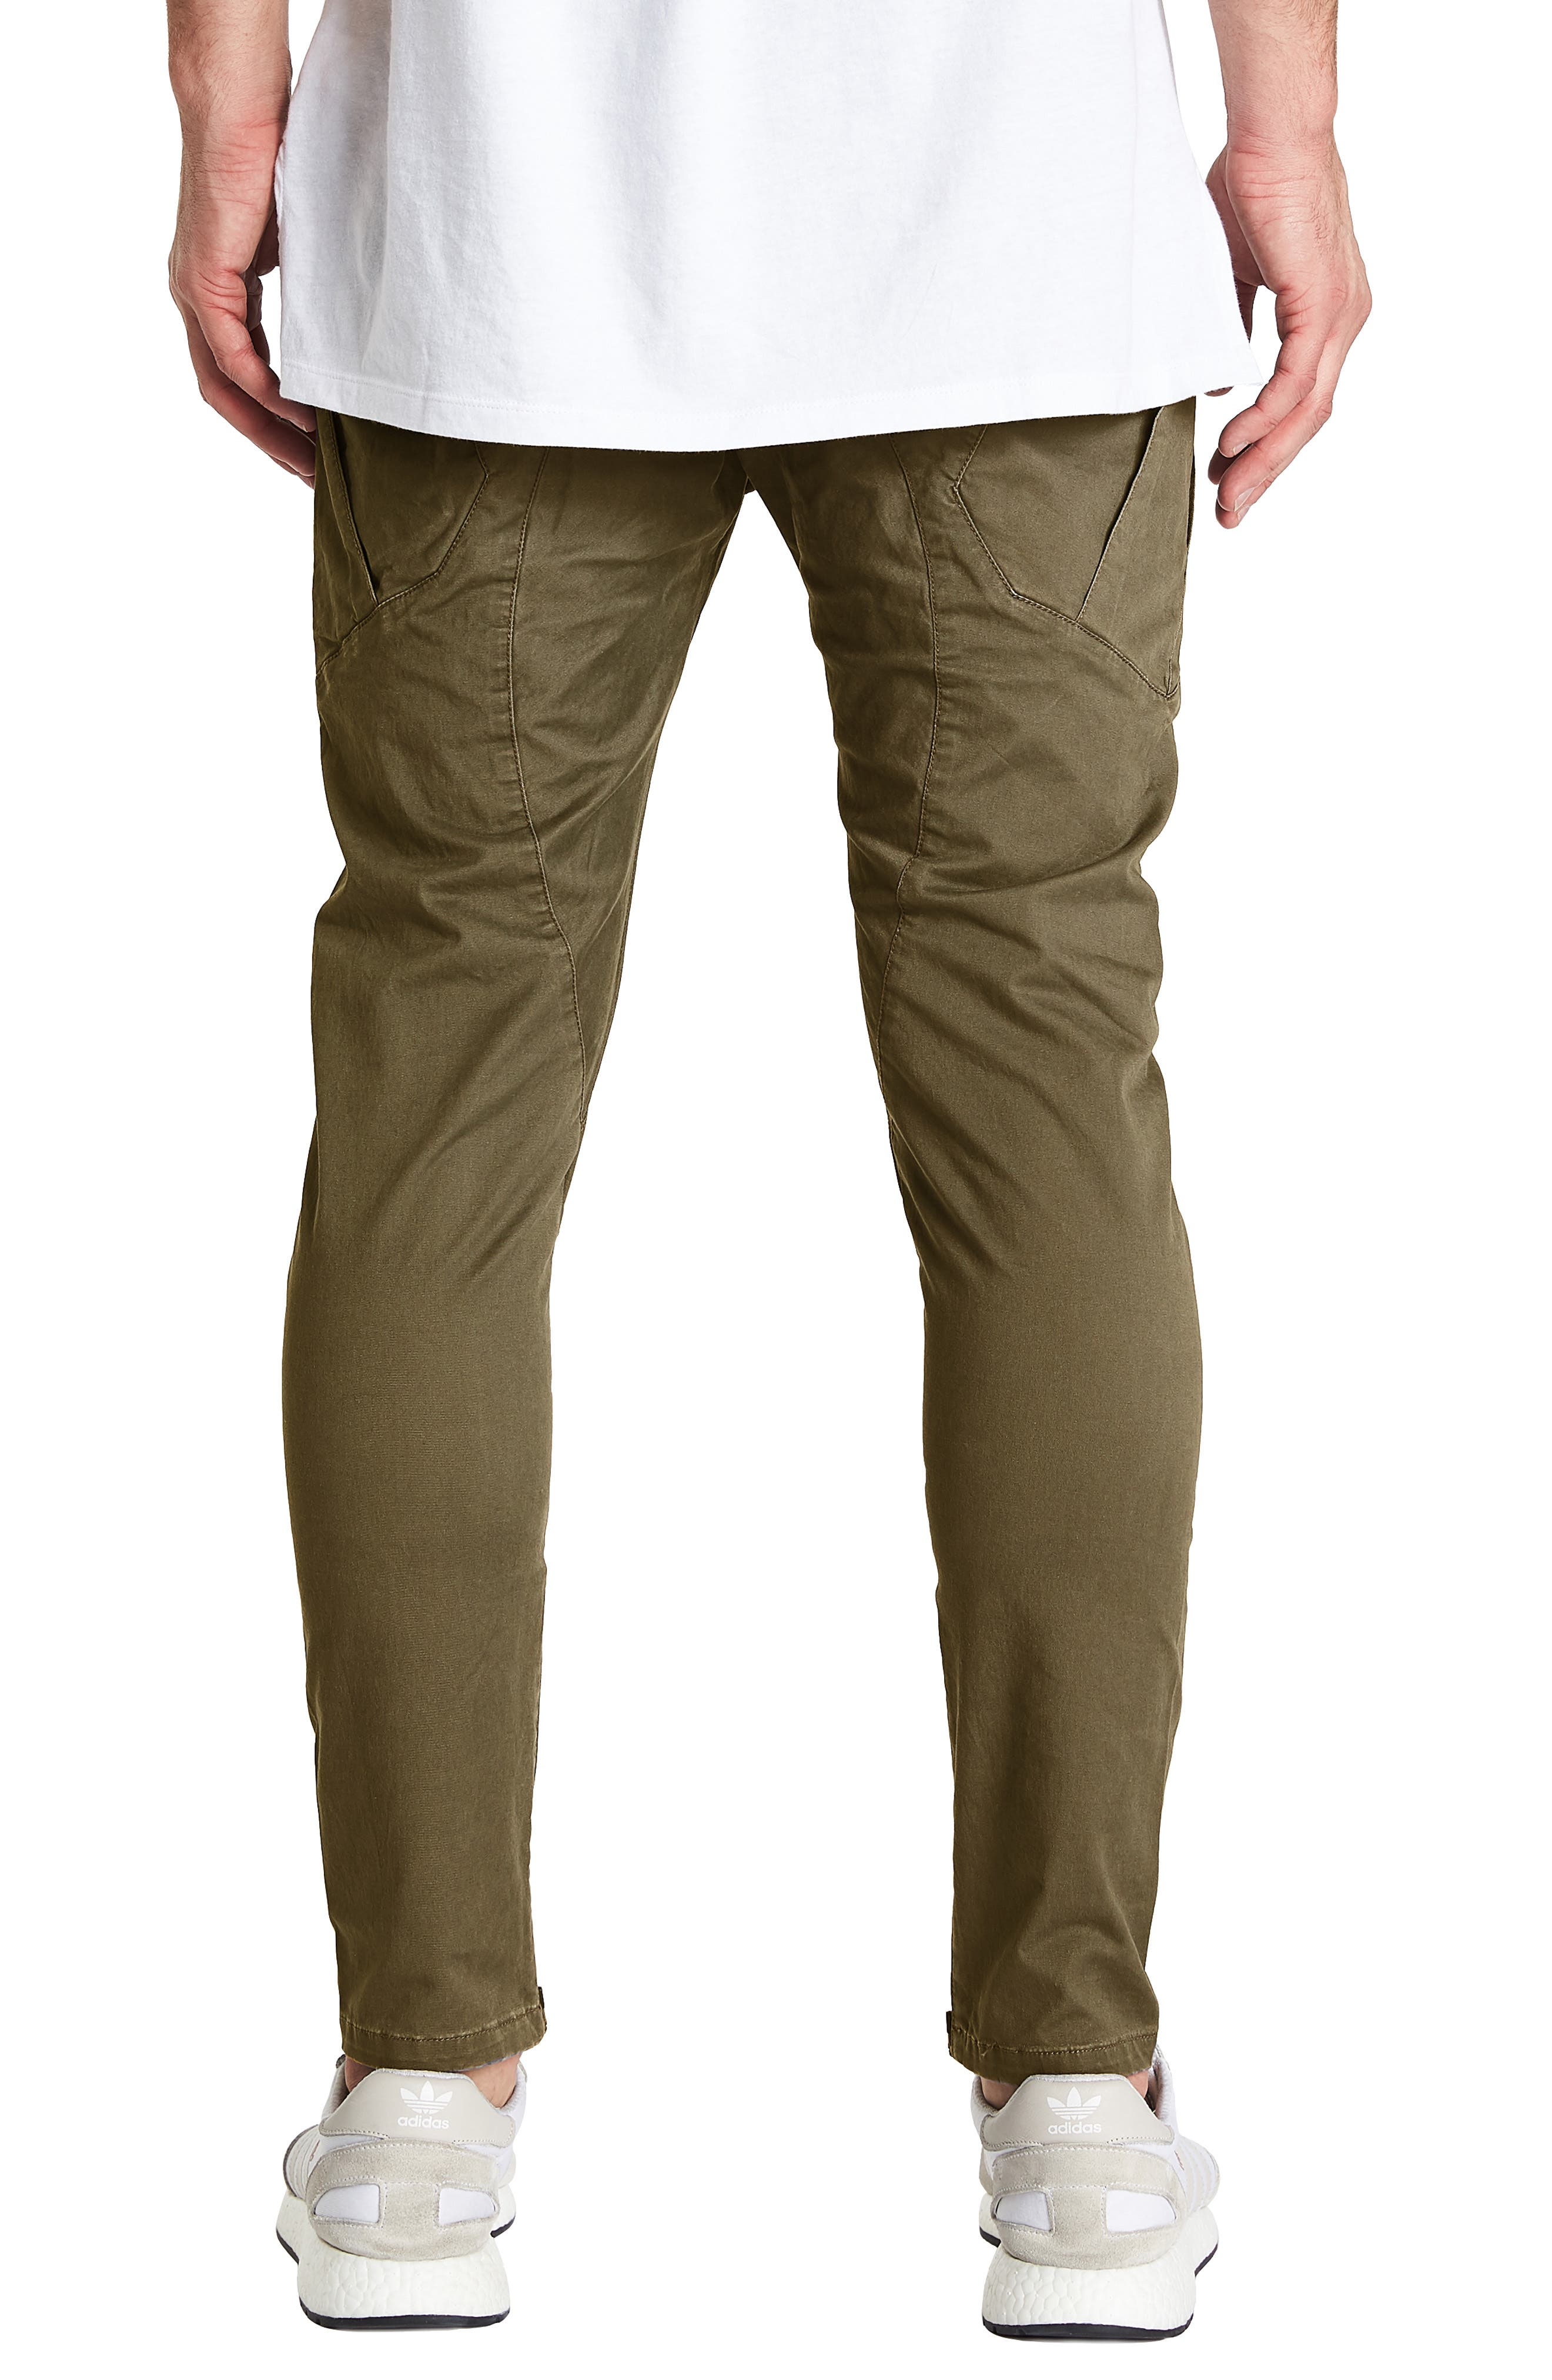 Tactical Slim Fit Pants,                             Alternate thumbnail 2, color,                             IVY GREEN